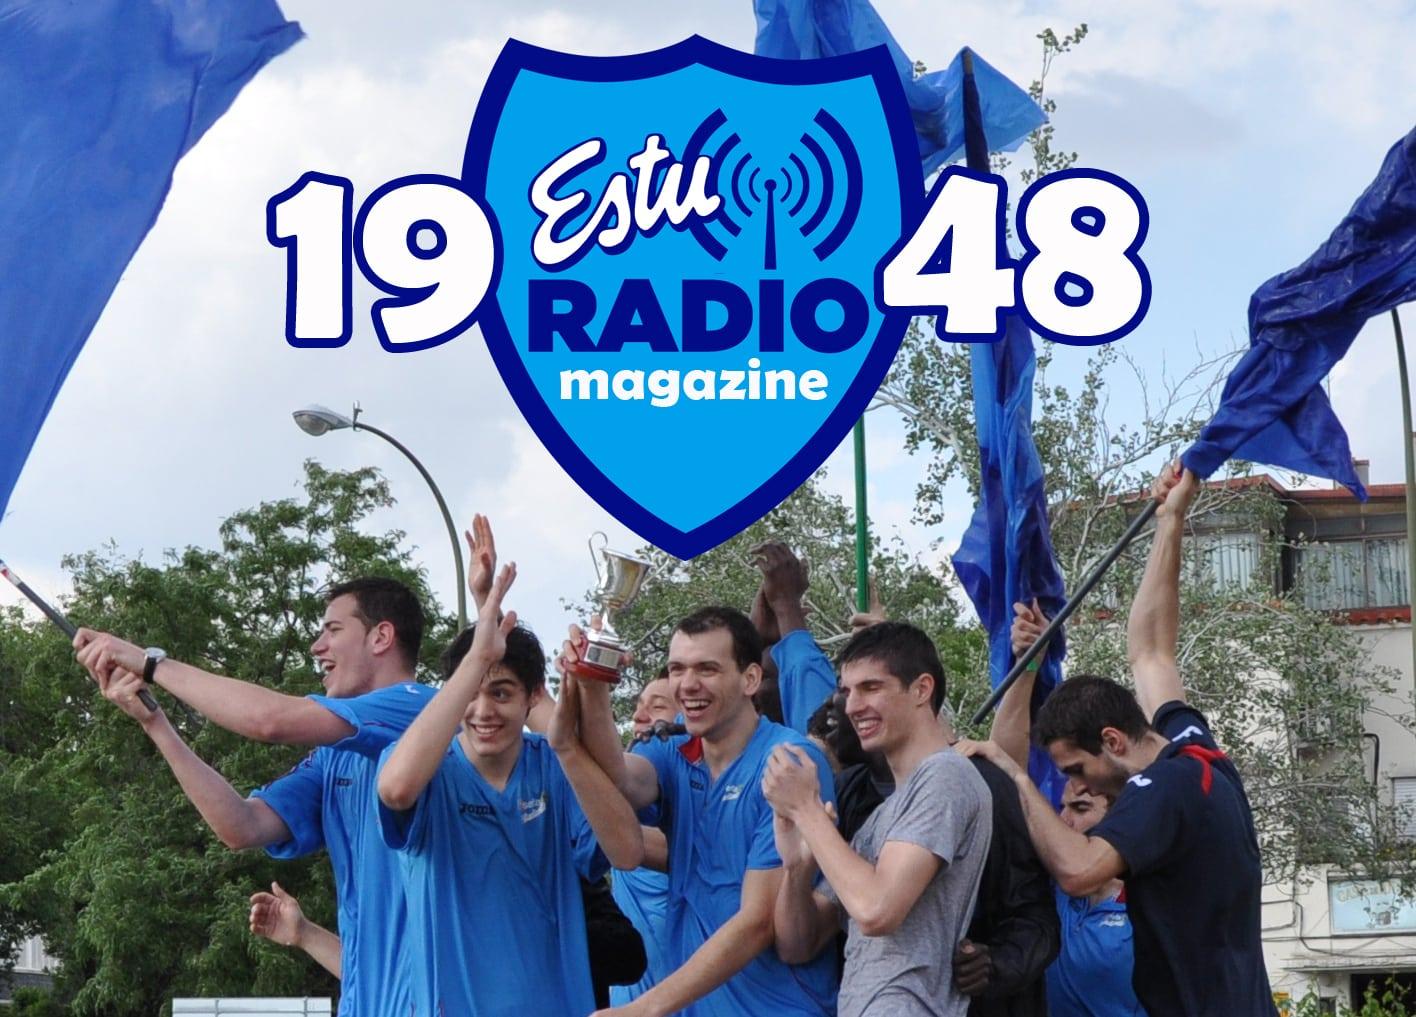 Un magazine plateado, rosa y azul. Escucha ya el podcast